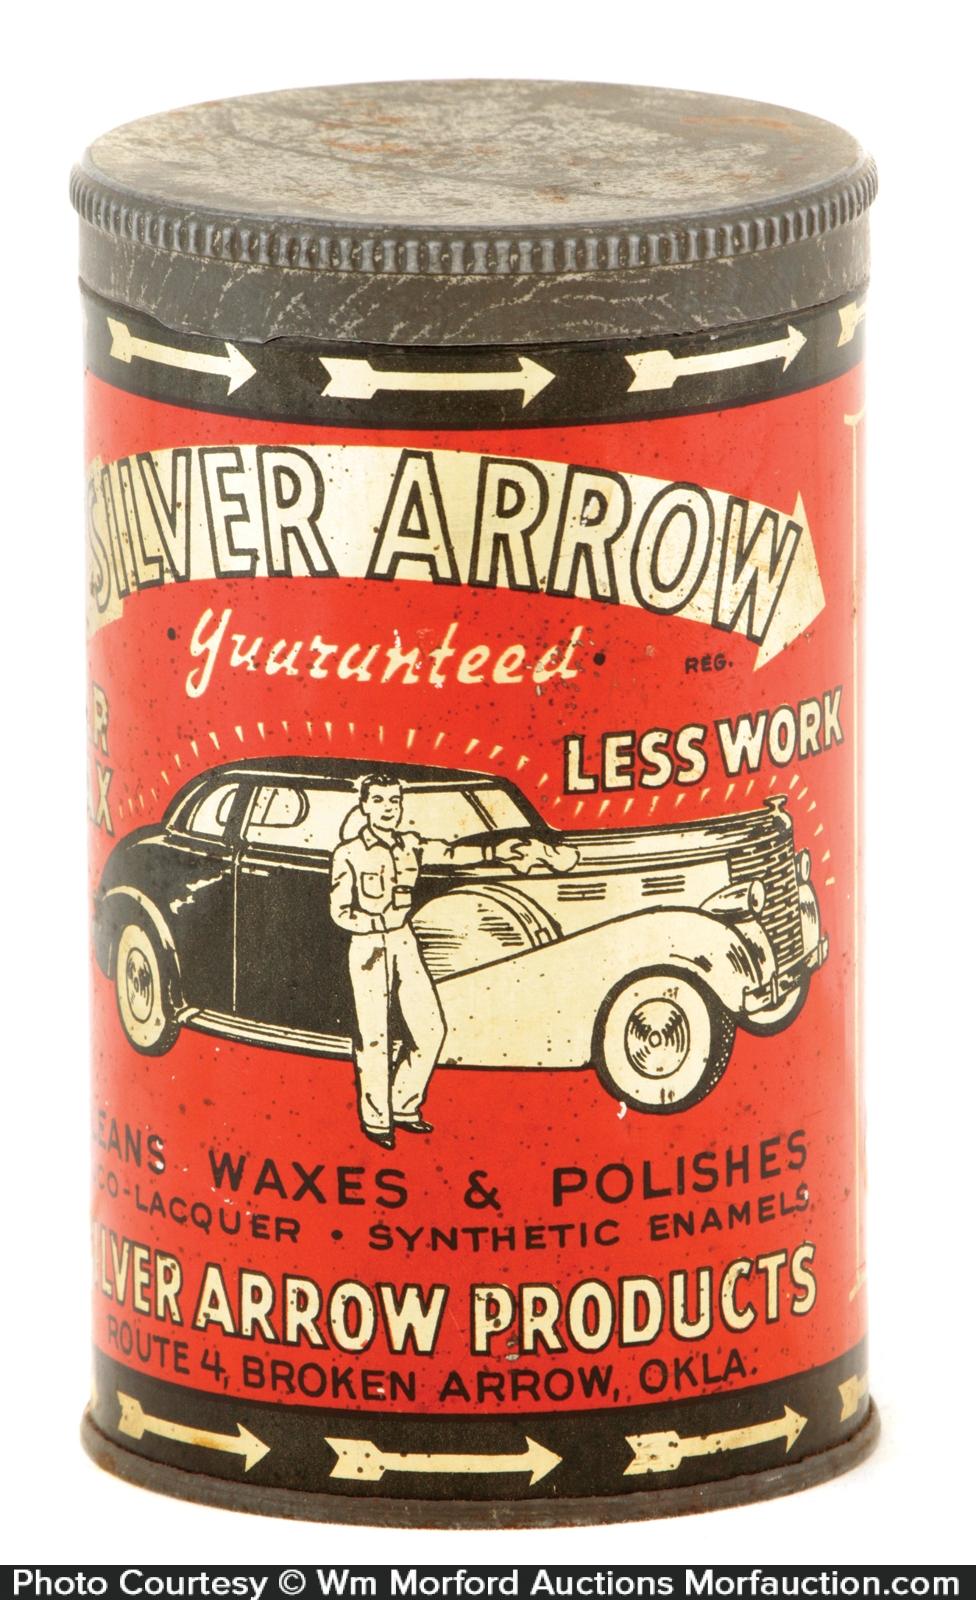 Silver Arrow Car Polish